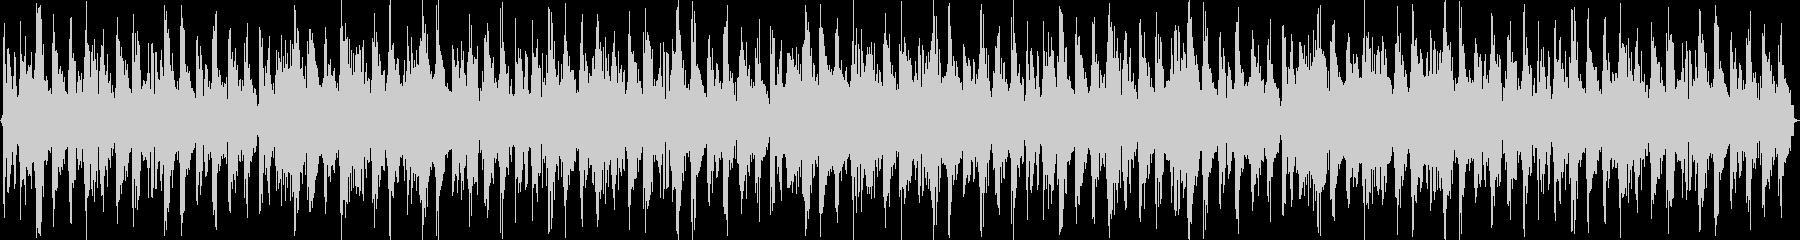 DJ用やループBGMとして使えるトランスの未再生の波形